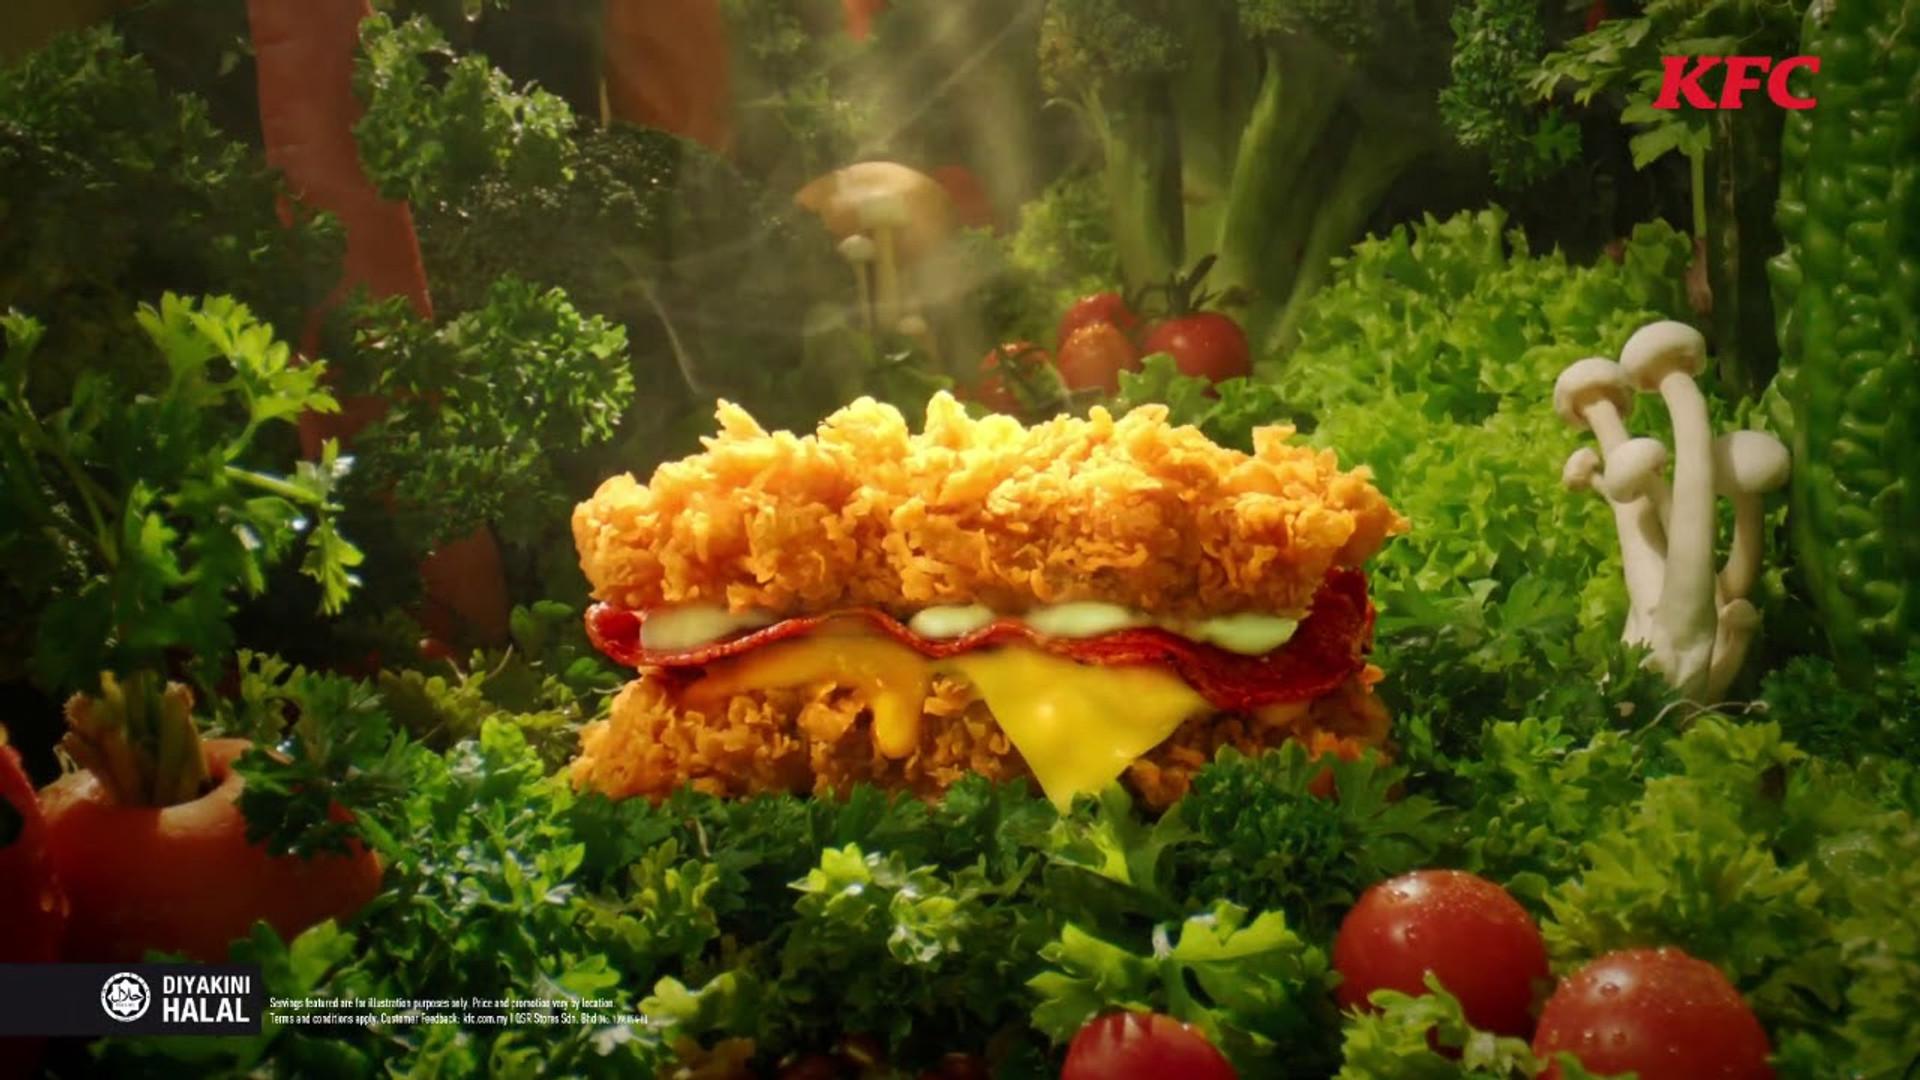 KFC - Zinger Double Down